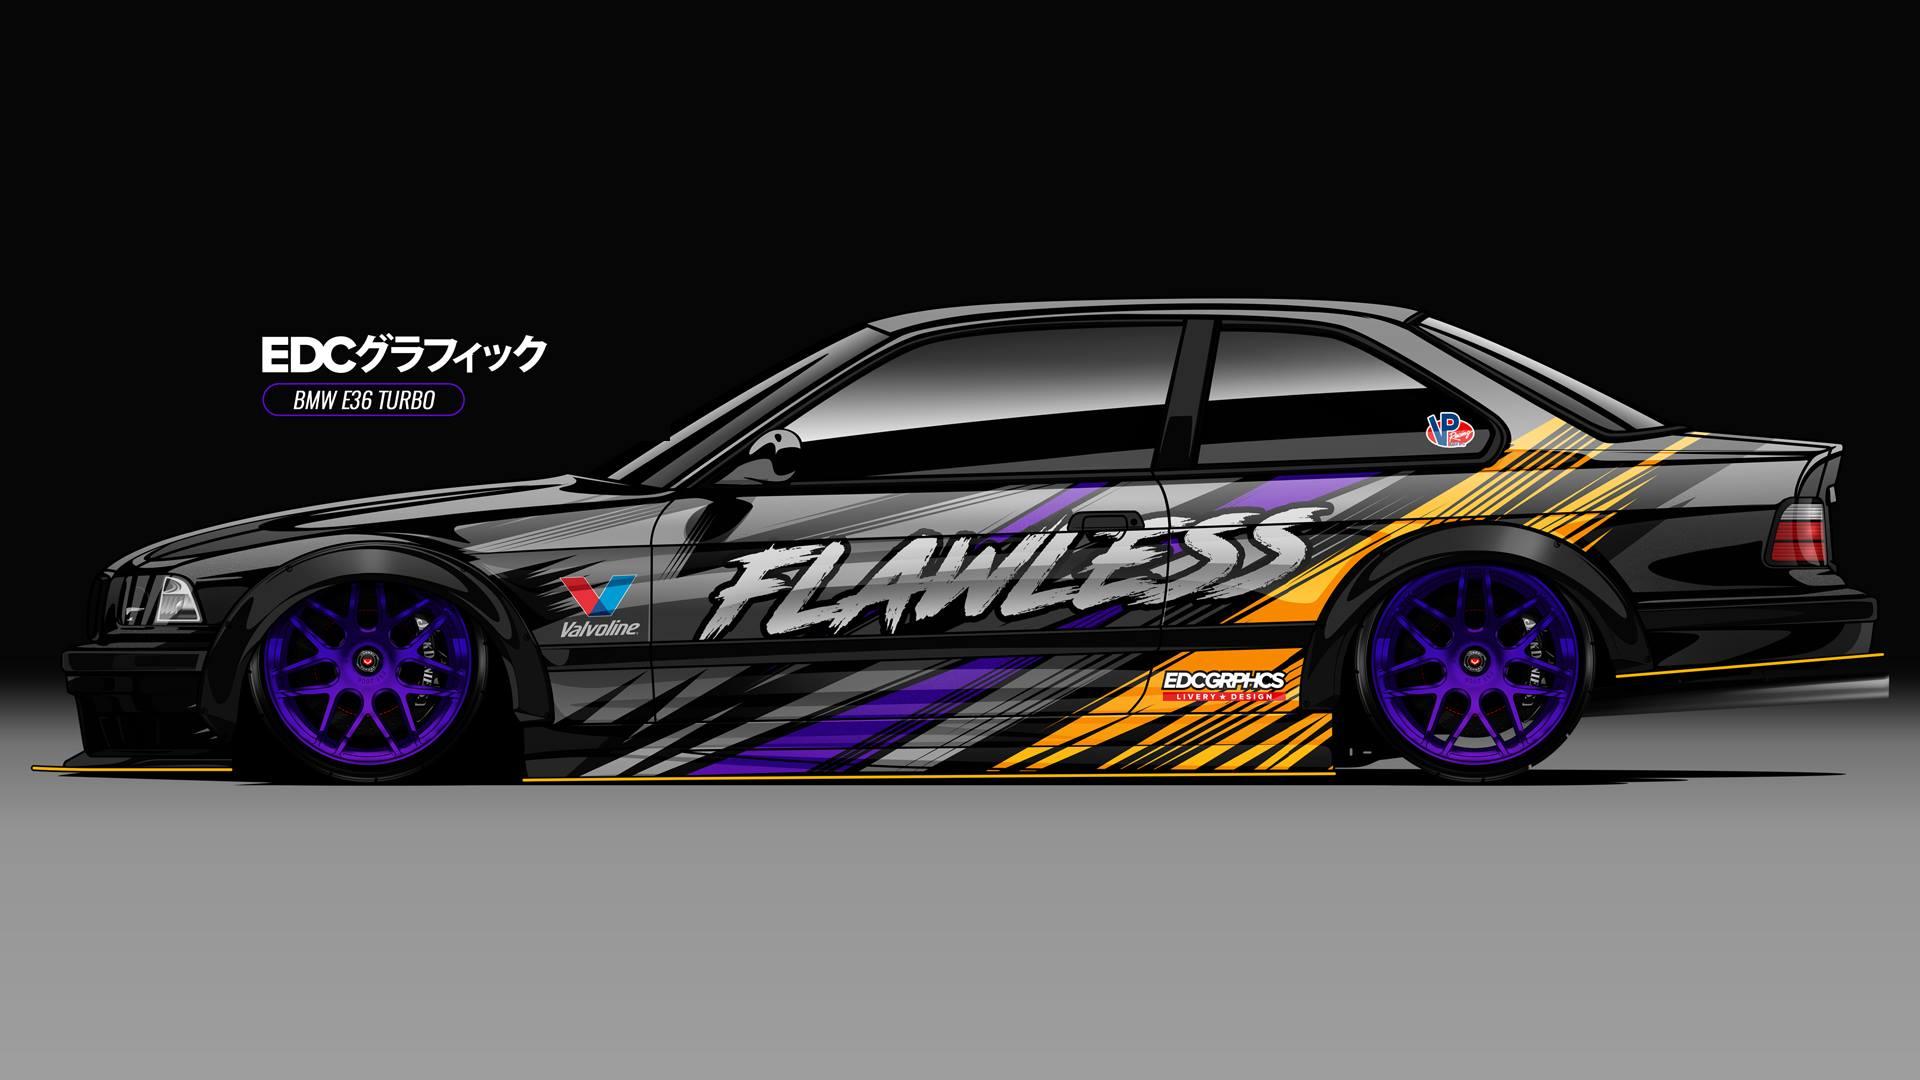 EDC Graphics, bmw m3 e36, BMW, render